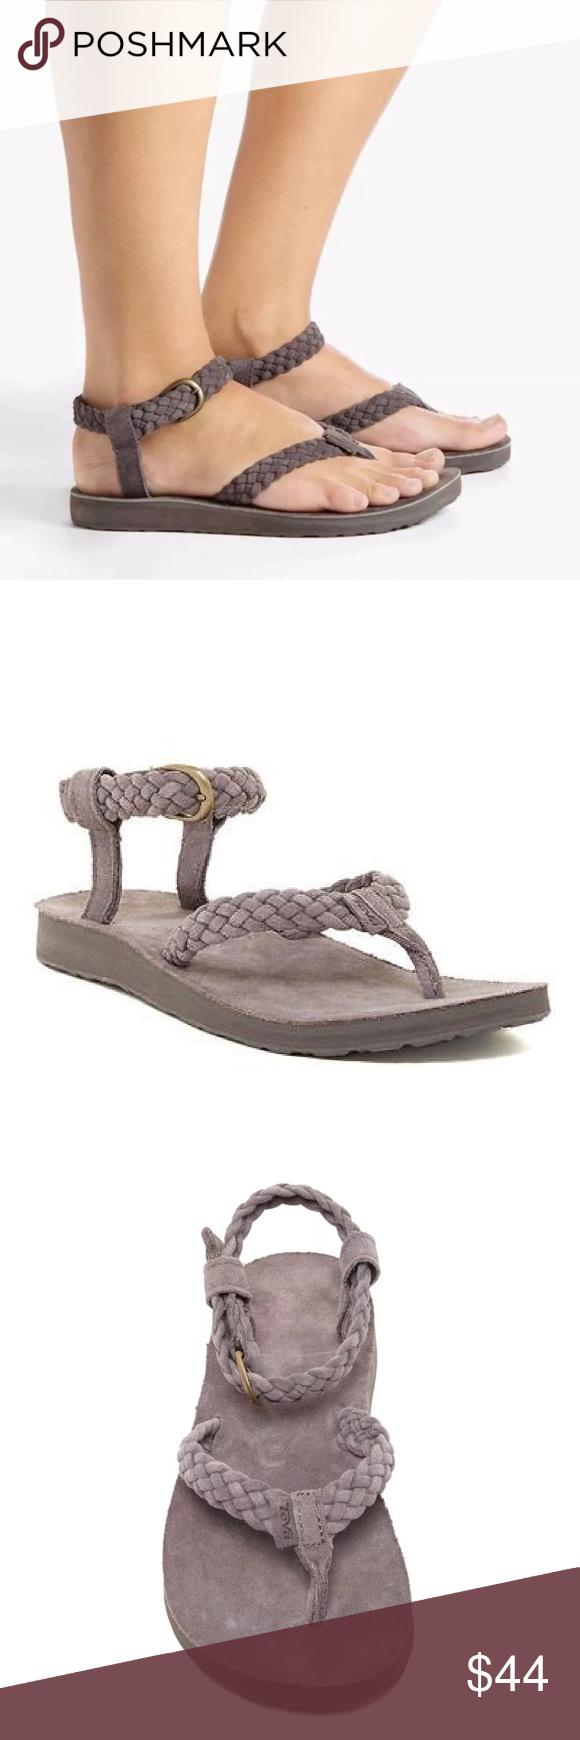 9097d399a225 New NIB Teva Original Suede Braid Thong Sandal NIB Teva Original Suede  Braid Thong Sandal Eiffel